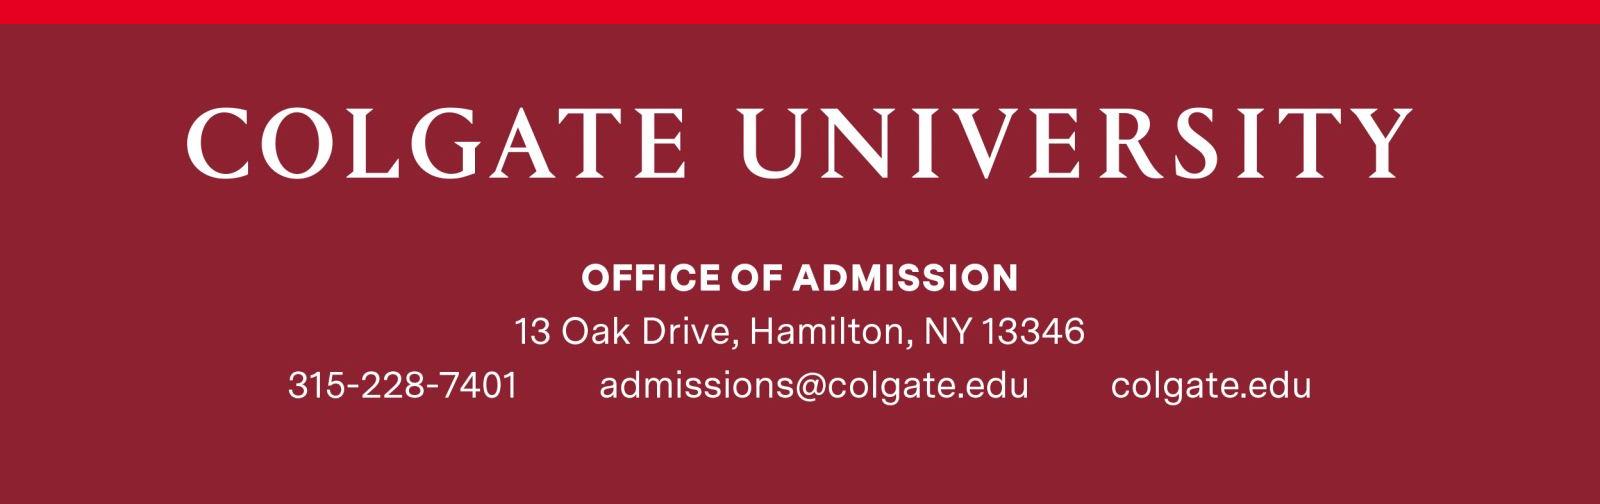 Colgate University Admission Footer